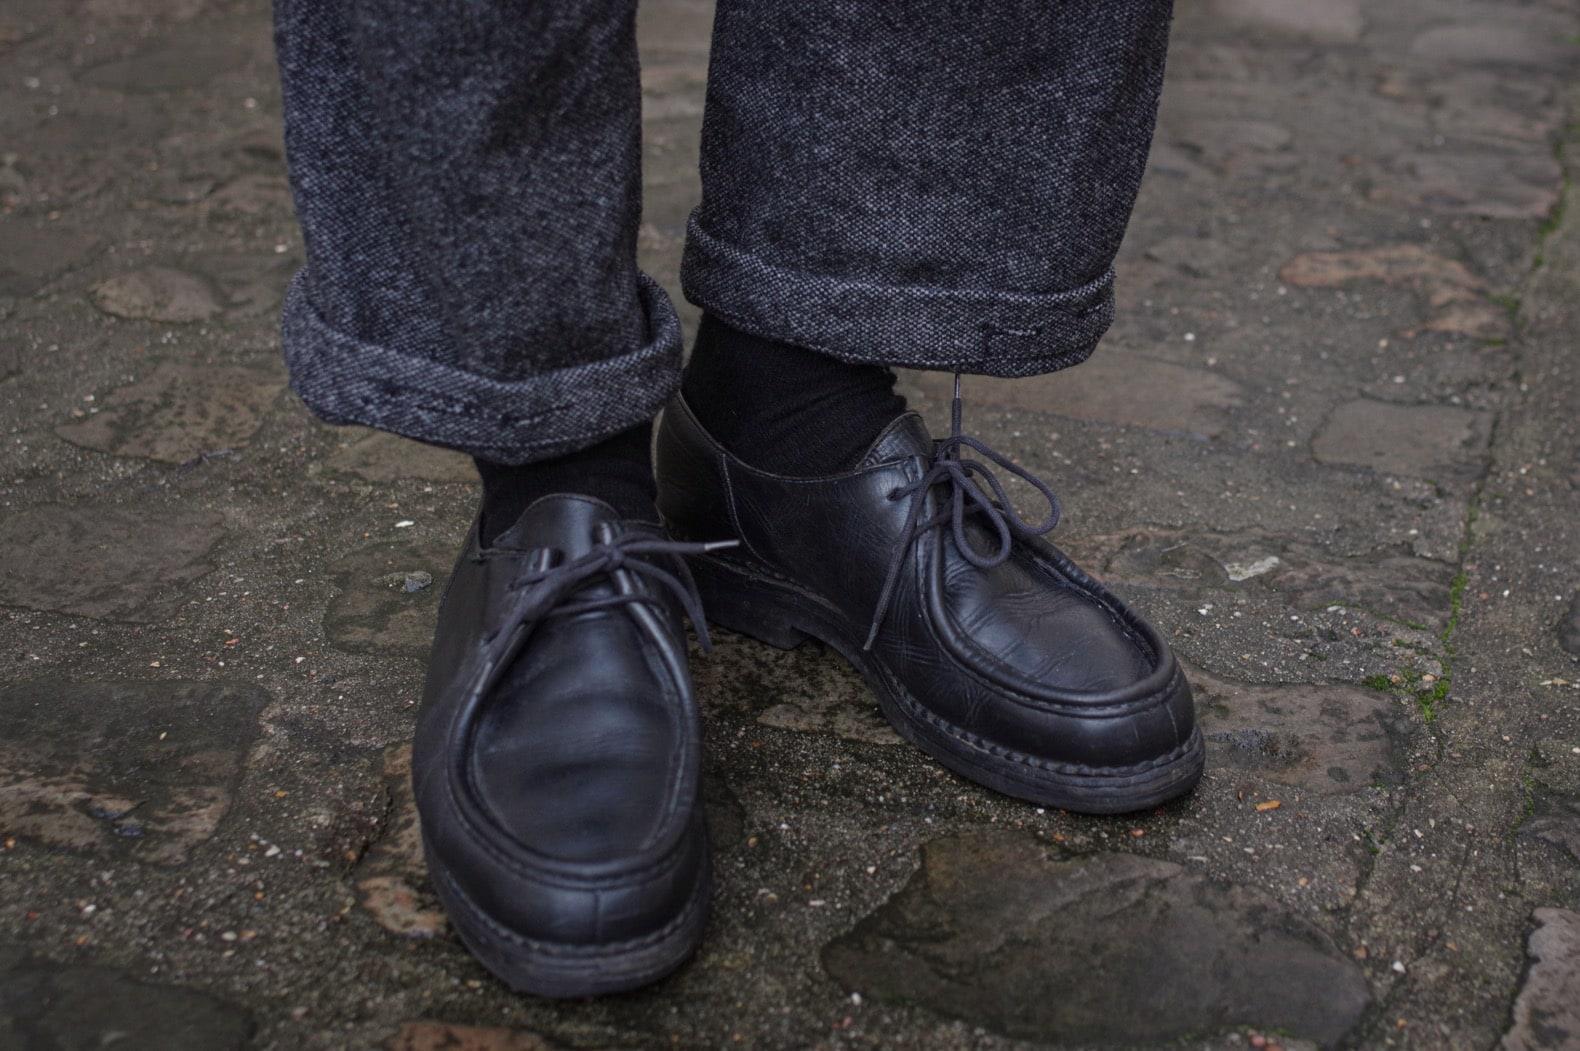 comment-porter-paraboot-michael-style-homme-homecore-chaussettes-cachemire